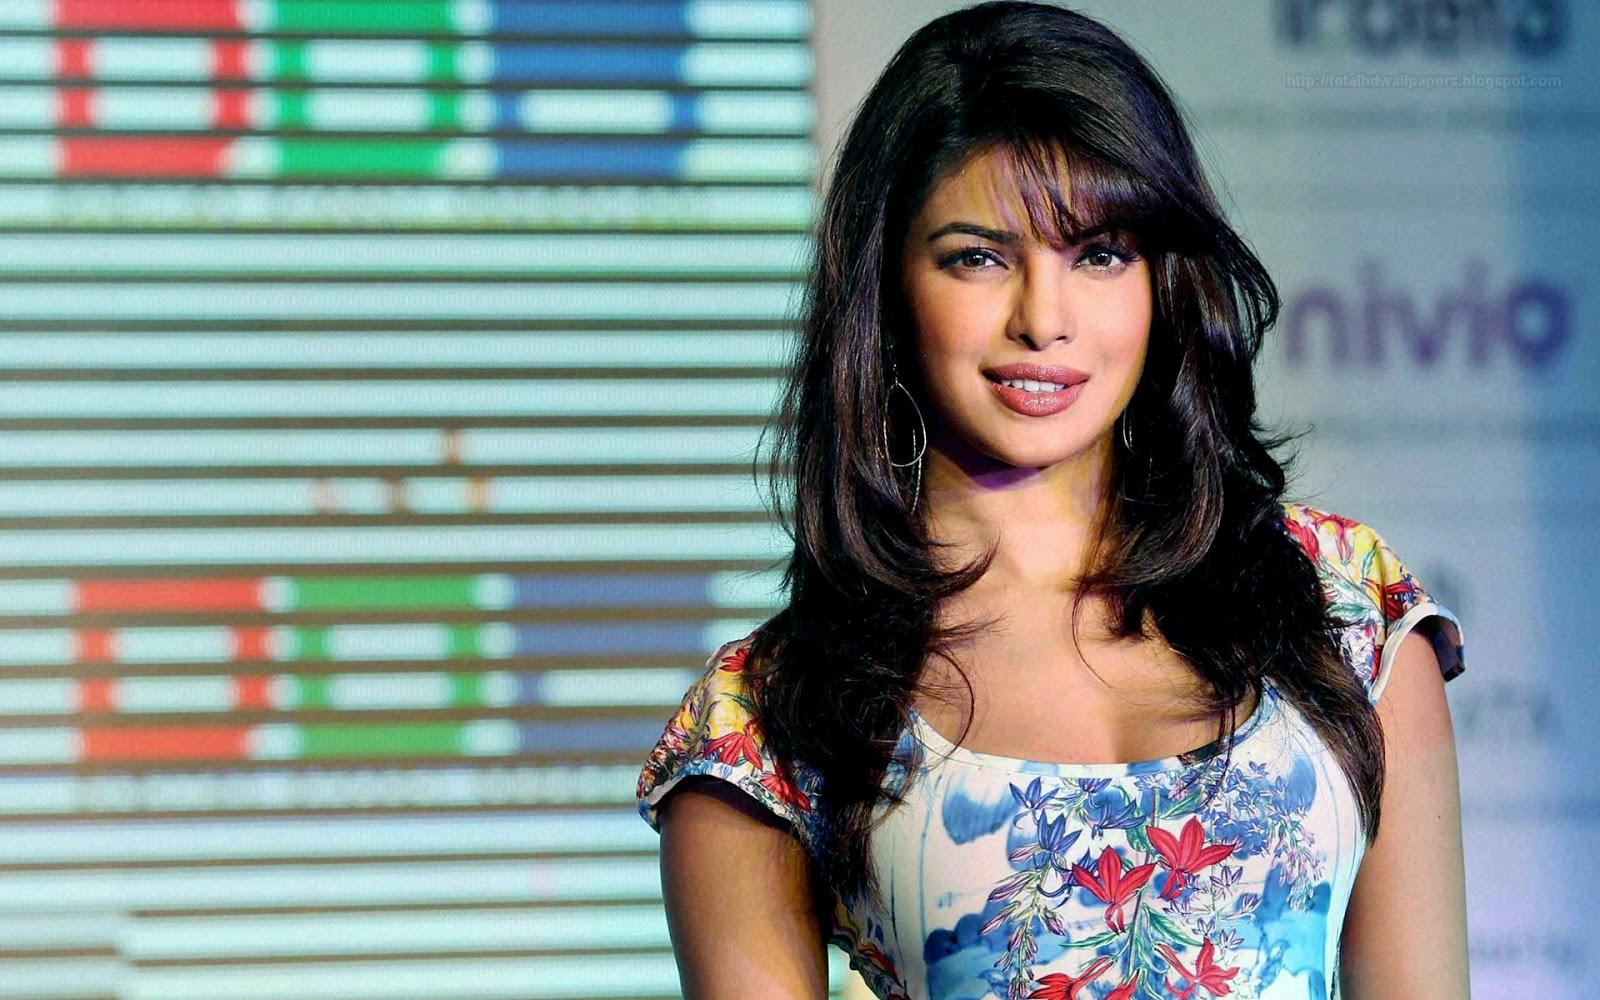 Actress Hd Wallpapers Hd Wallpapers: HD Wallpapers: Bollywood Actress HD Wallpapers 1080p